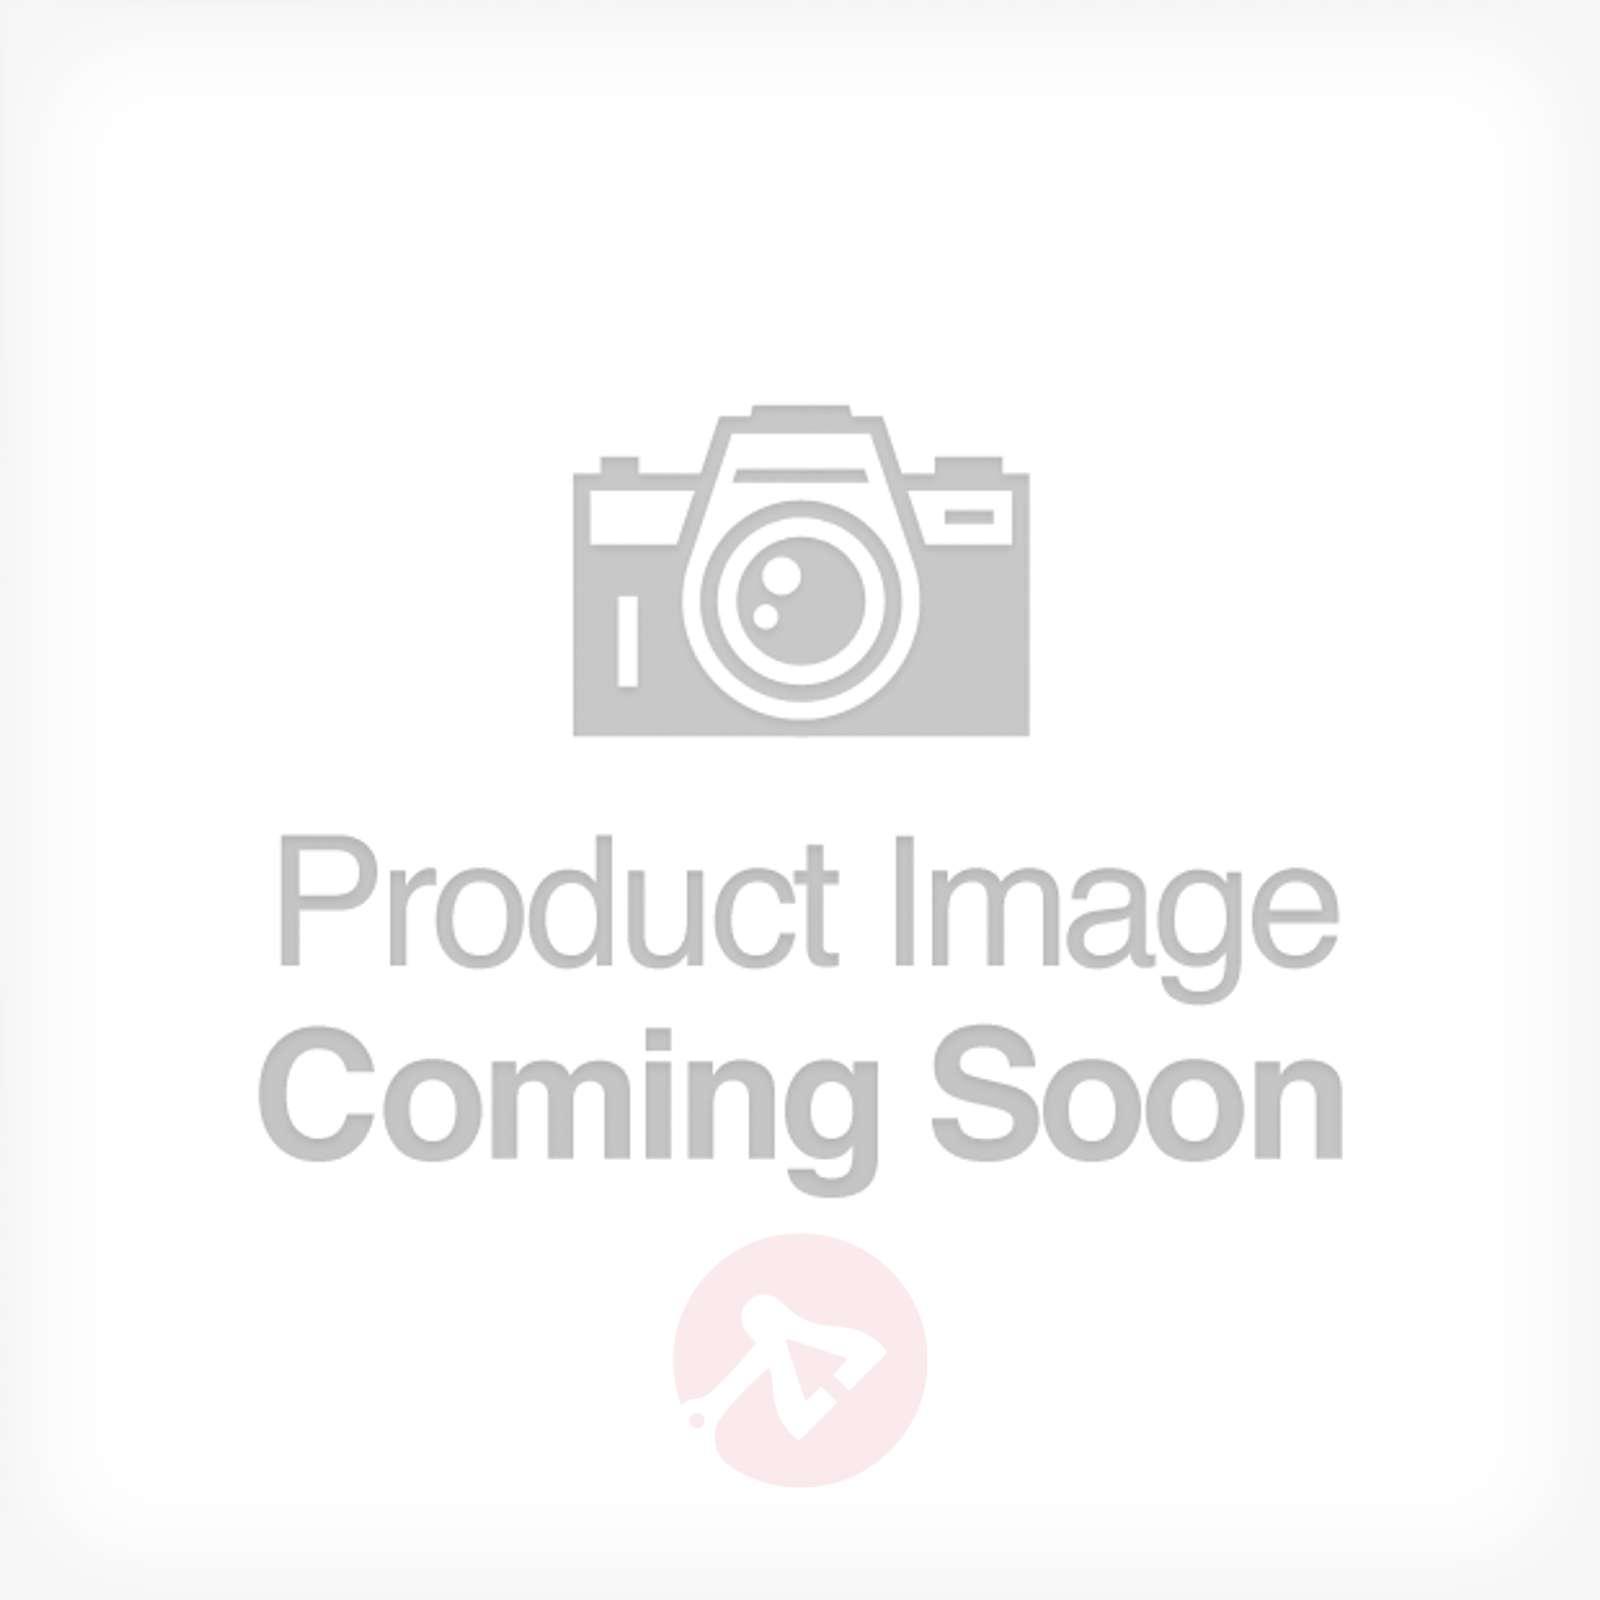 Betonijalka-koristevalaisin Cemmy-1523437X-01